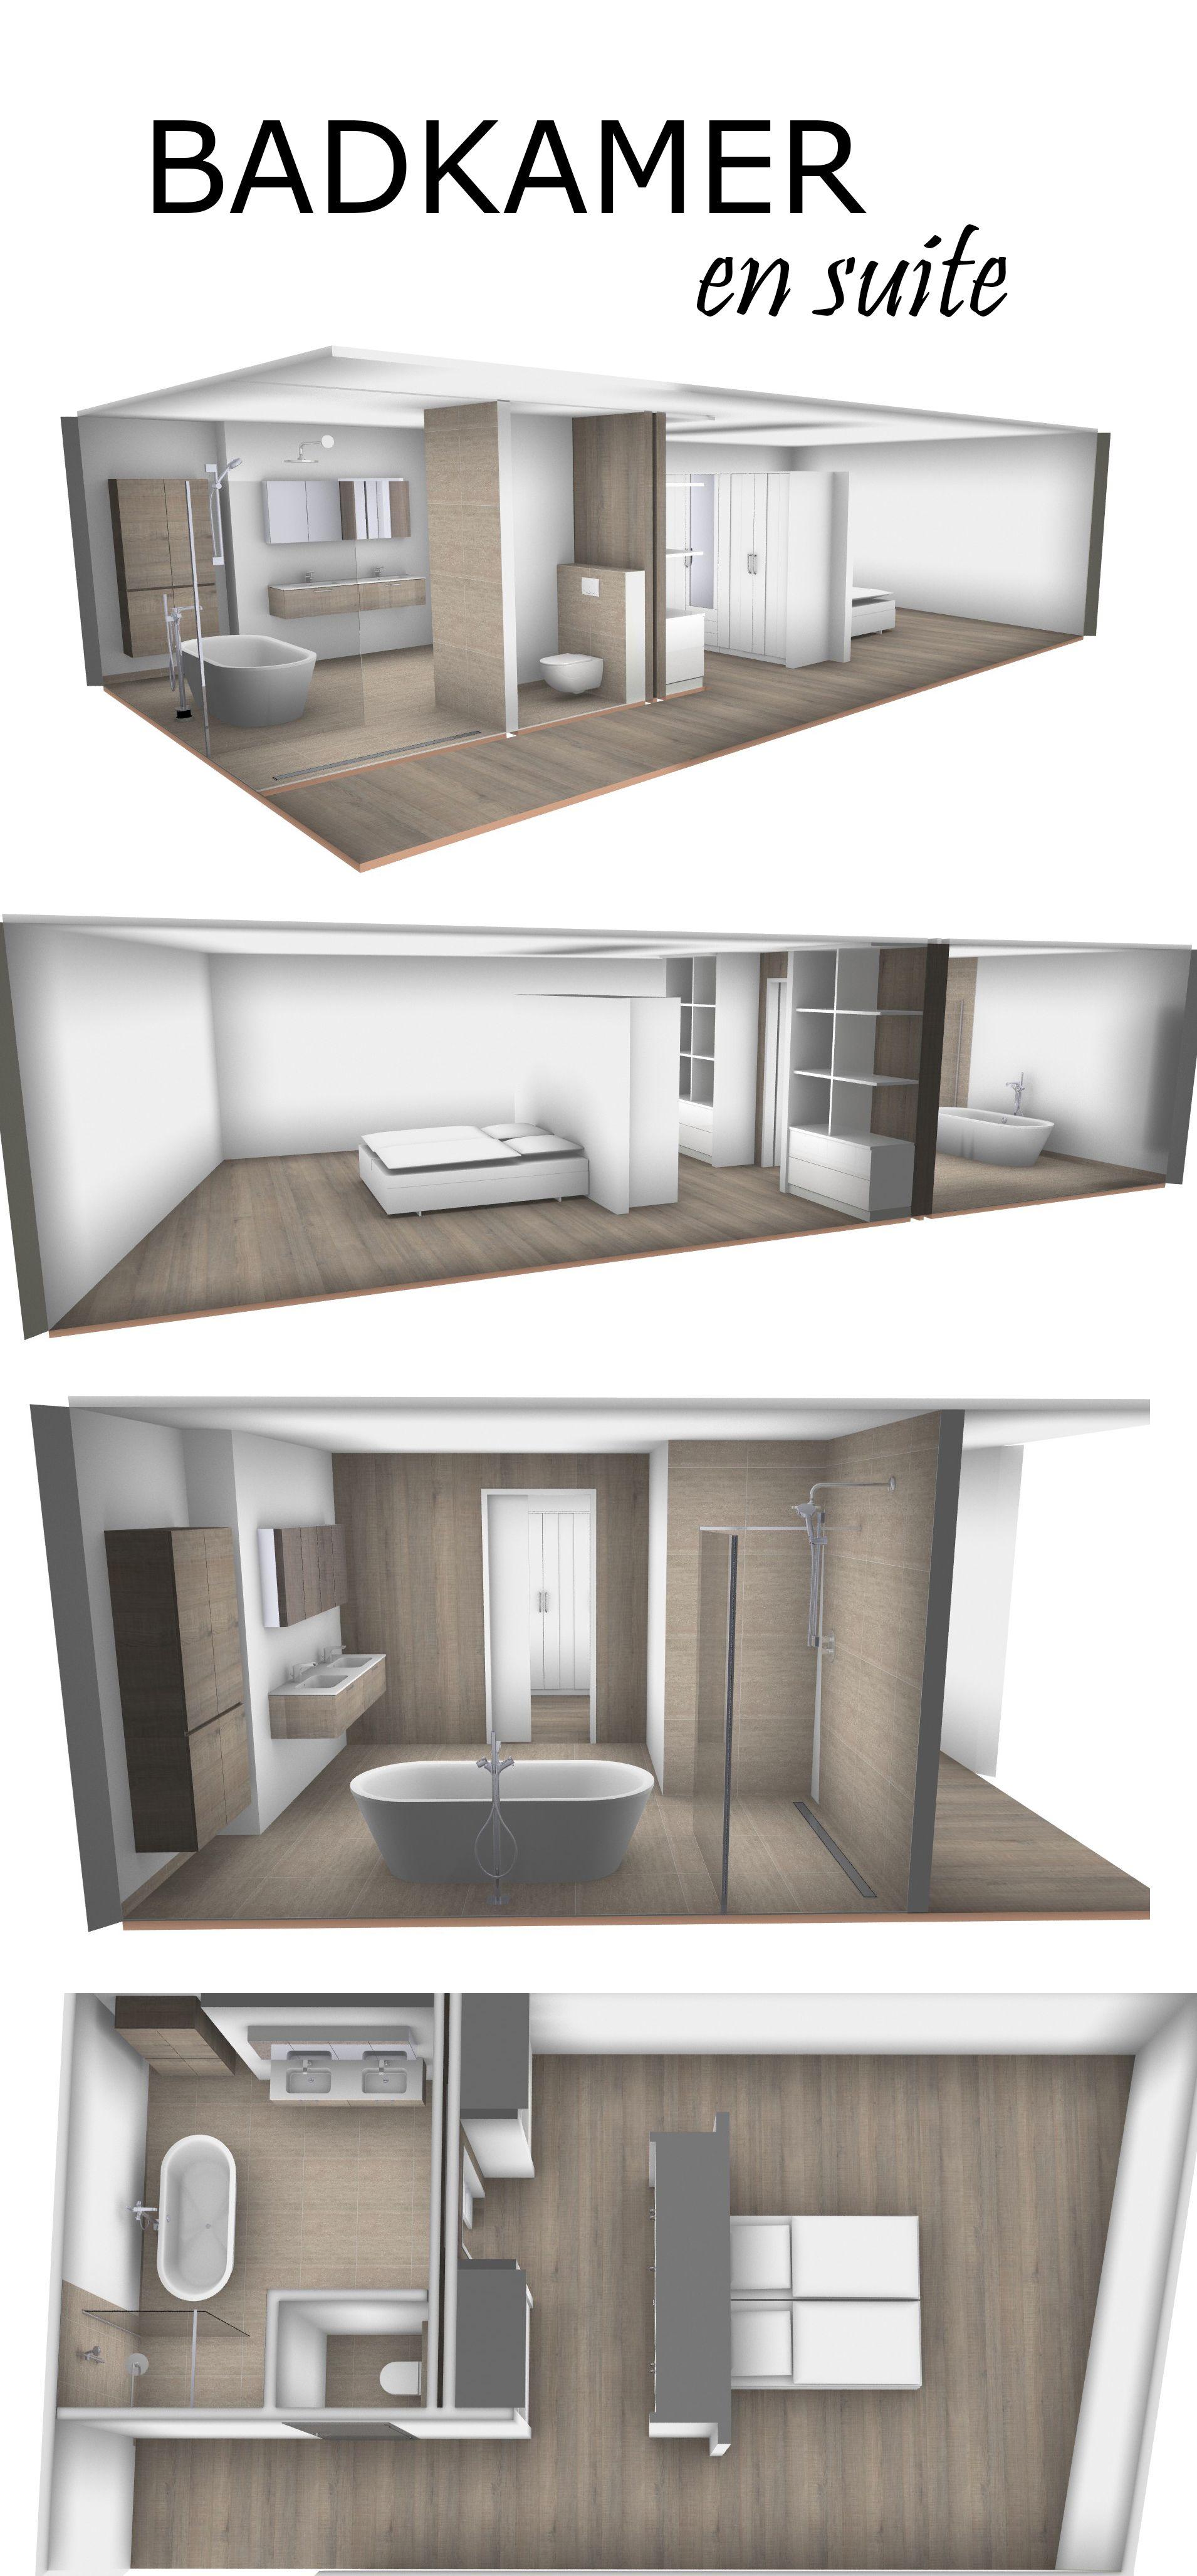 badkamer en suite ontwerp van wanrooij keuken badkamer tegel warenhuys olympics